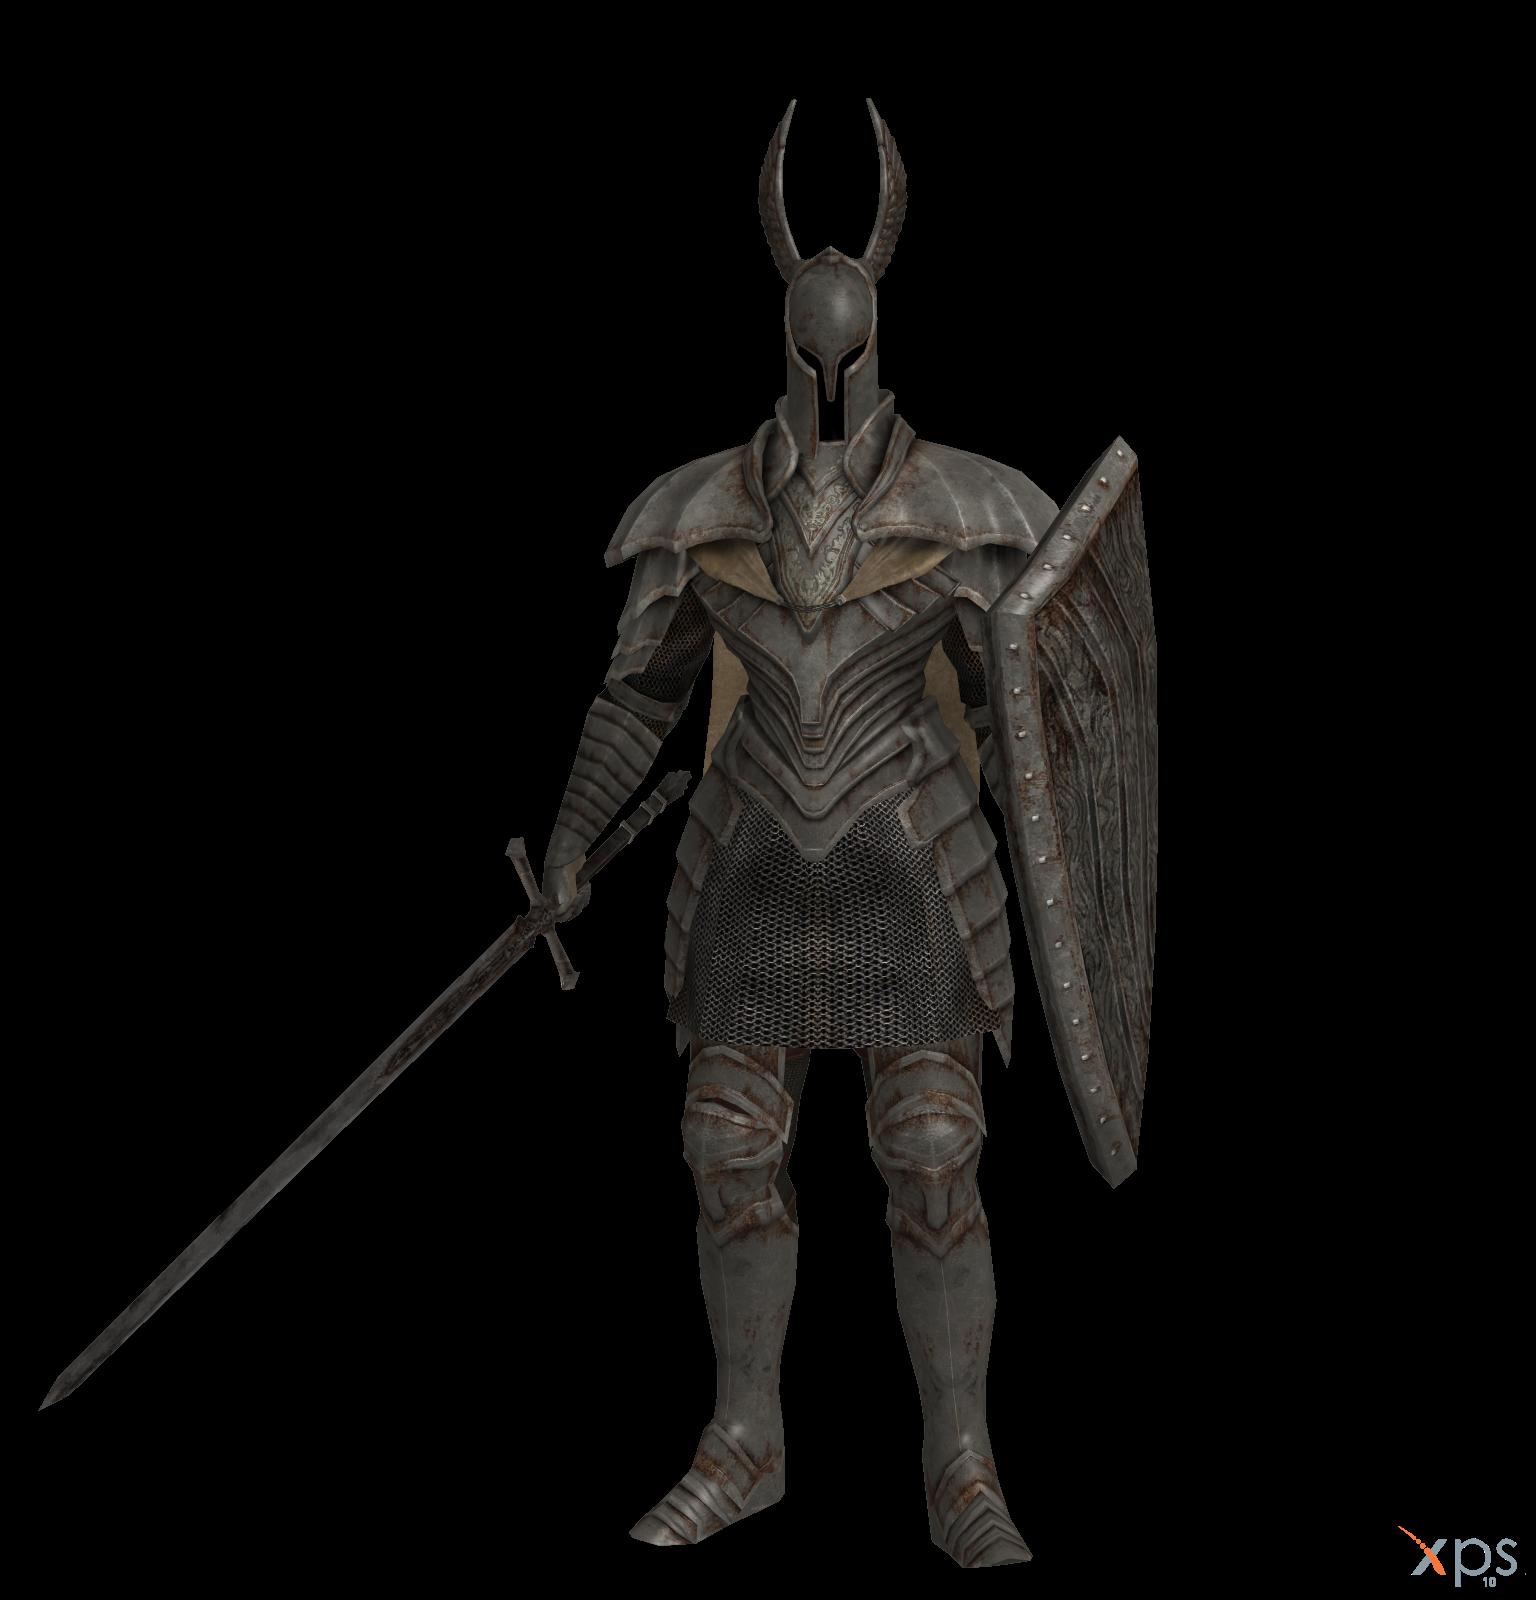 Dark Souls - Silver Knight by Bringess on DeviantArt